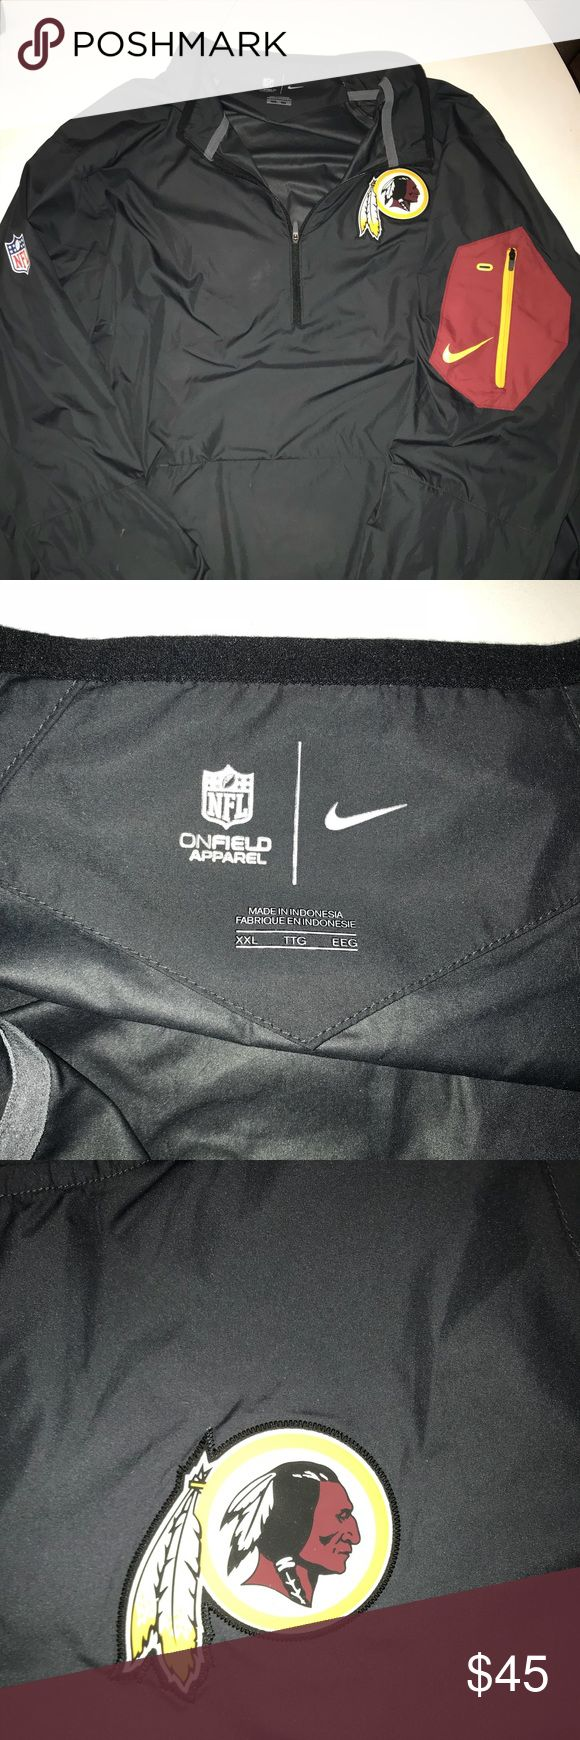 XXL Washington Redskins Nike Dri-Fit Jacket XXL Nike Dri-fit Washington Redskins Jacket. Basically brand new. 9/10 condition. Fits more like an XL. Retail ~$100 Nike Jackets & Coats Performance Jackets